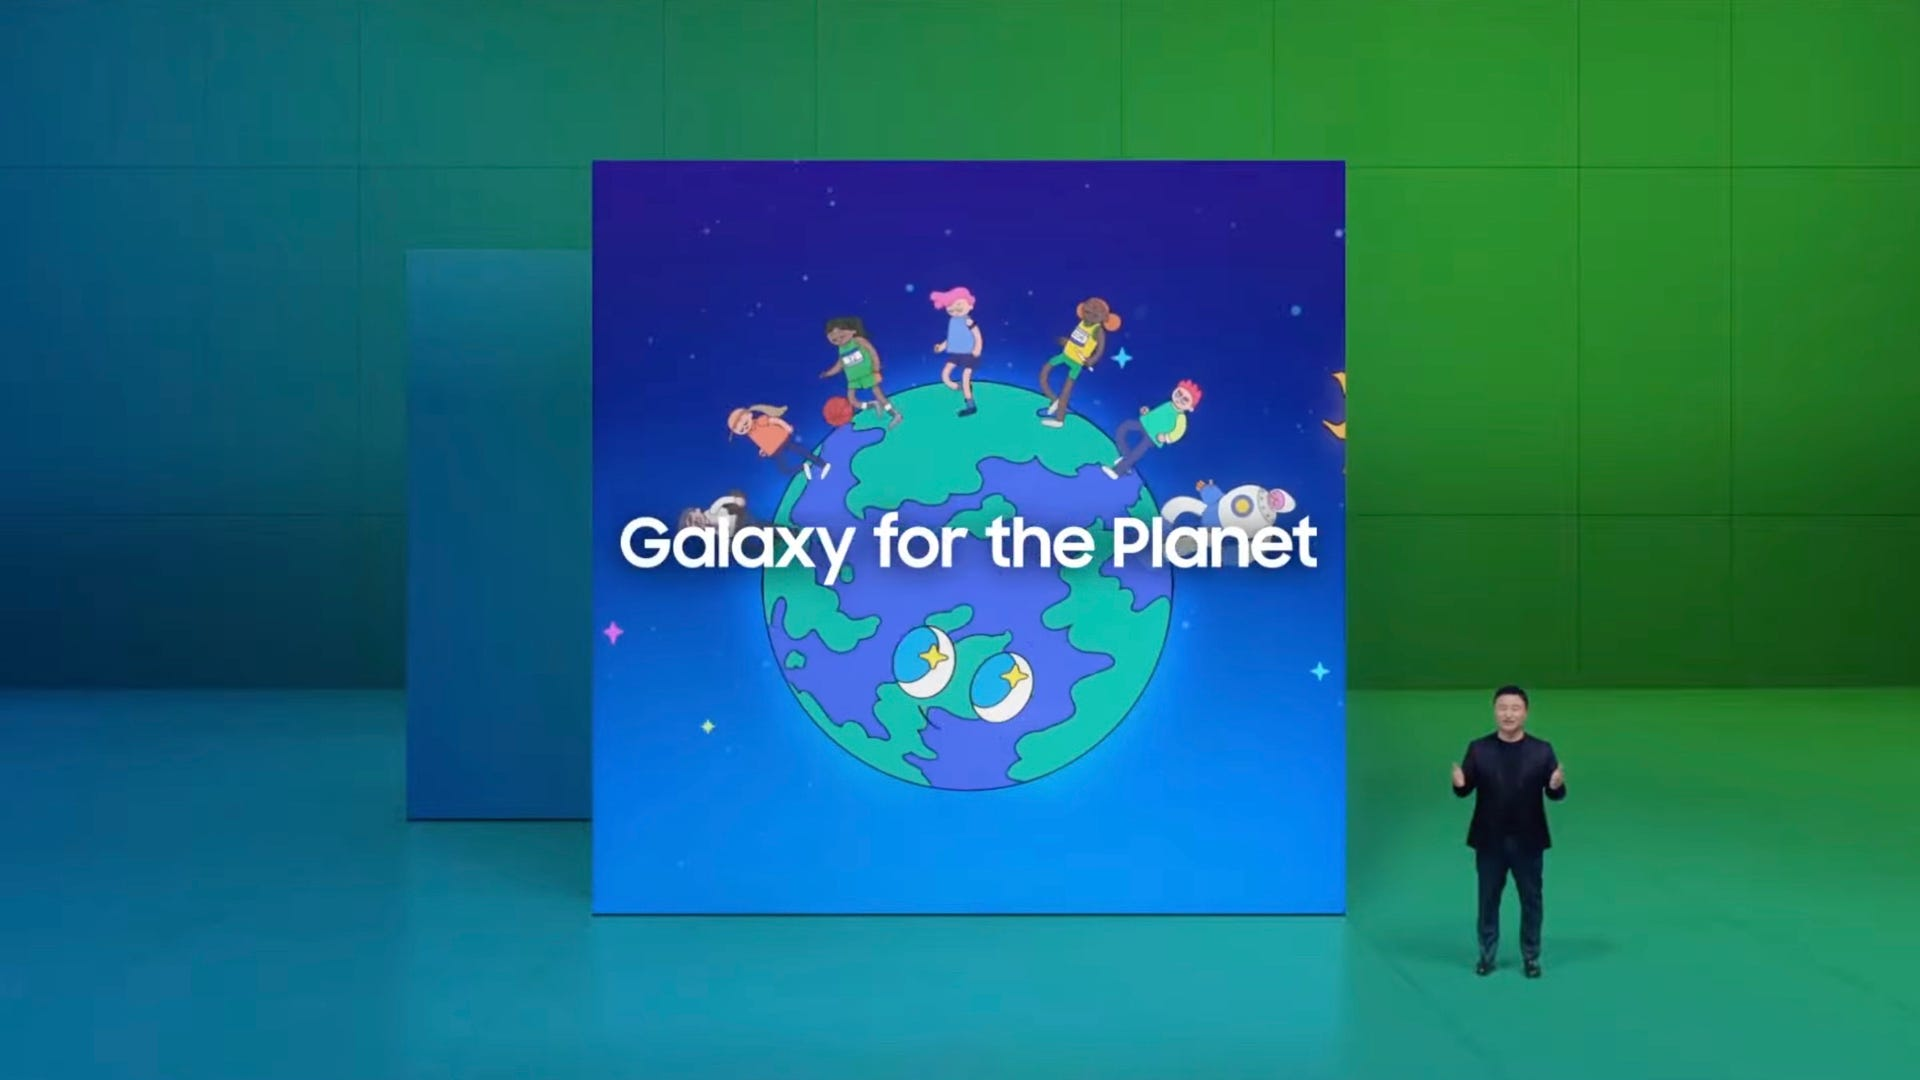 Samsung's green initiative